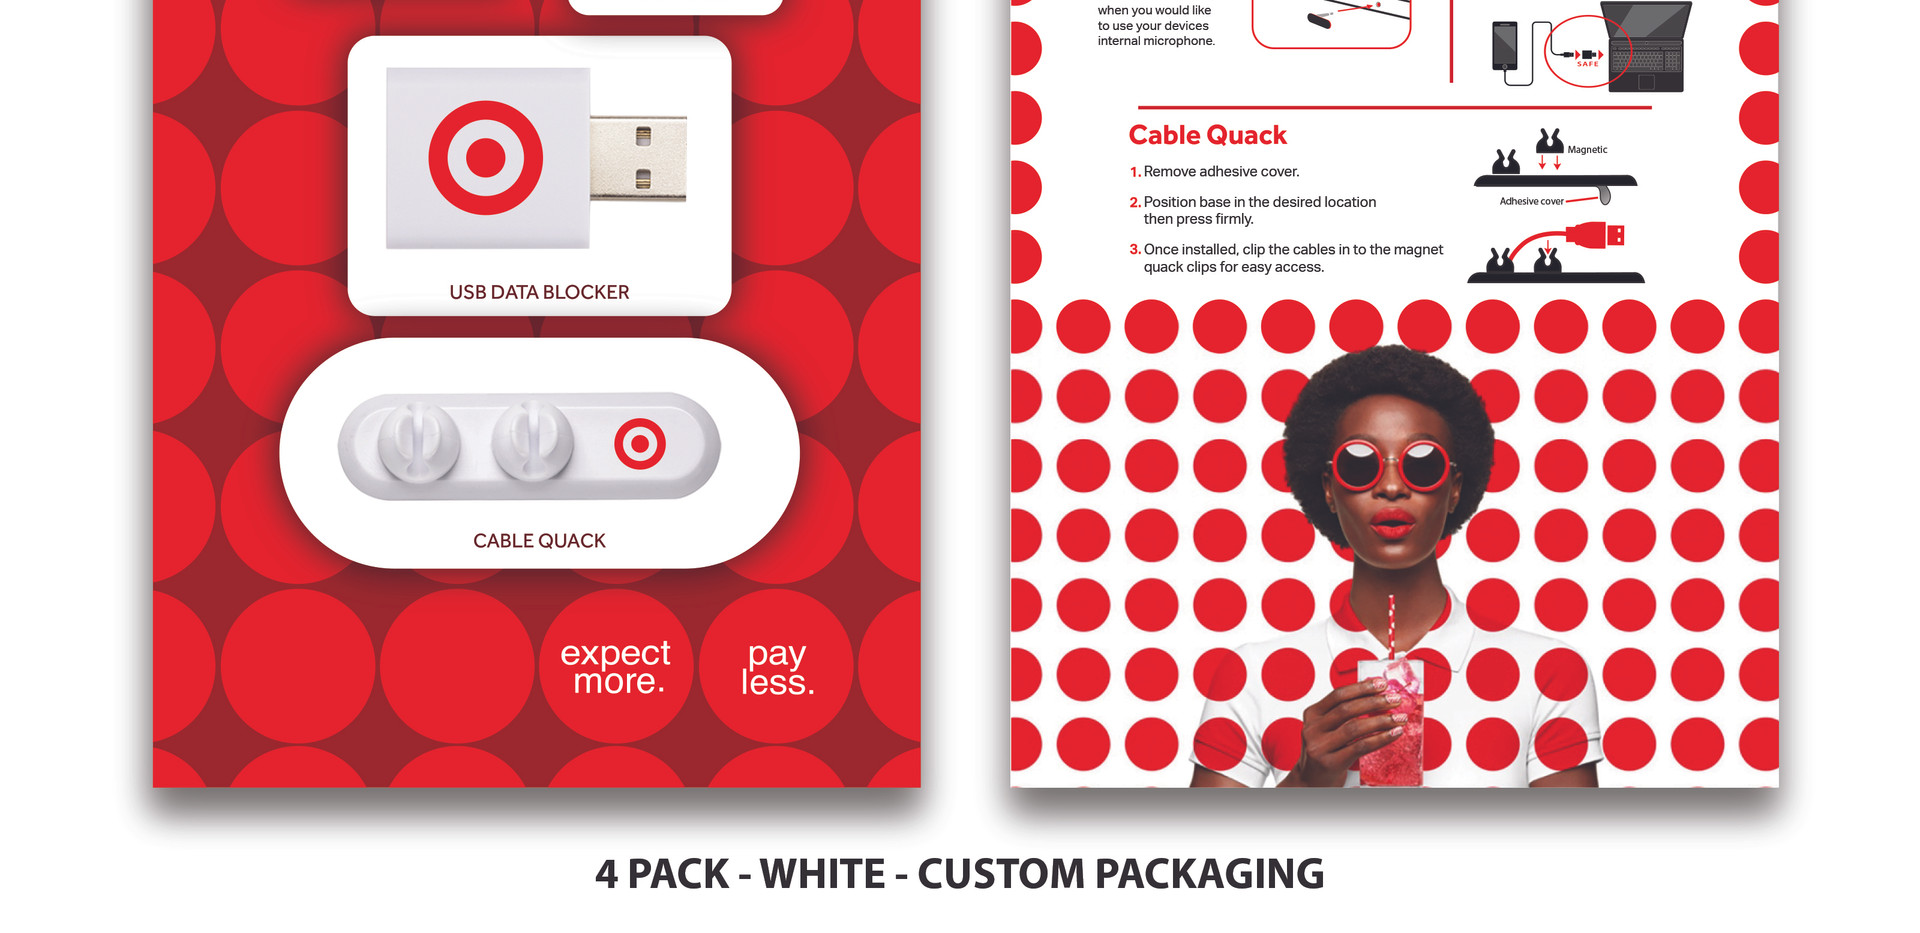 Target 4P 5x8 custom packaging white.jpg